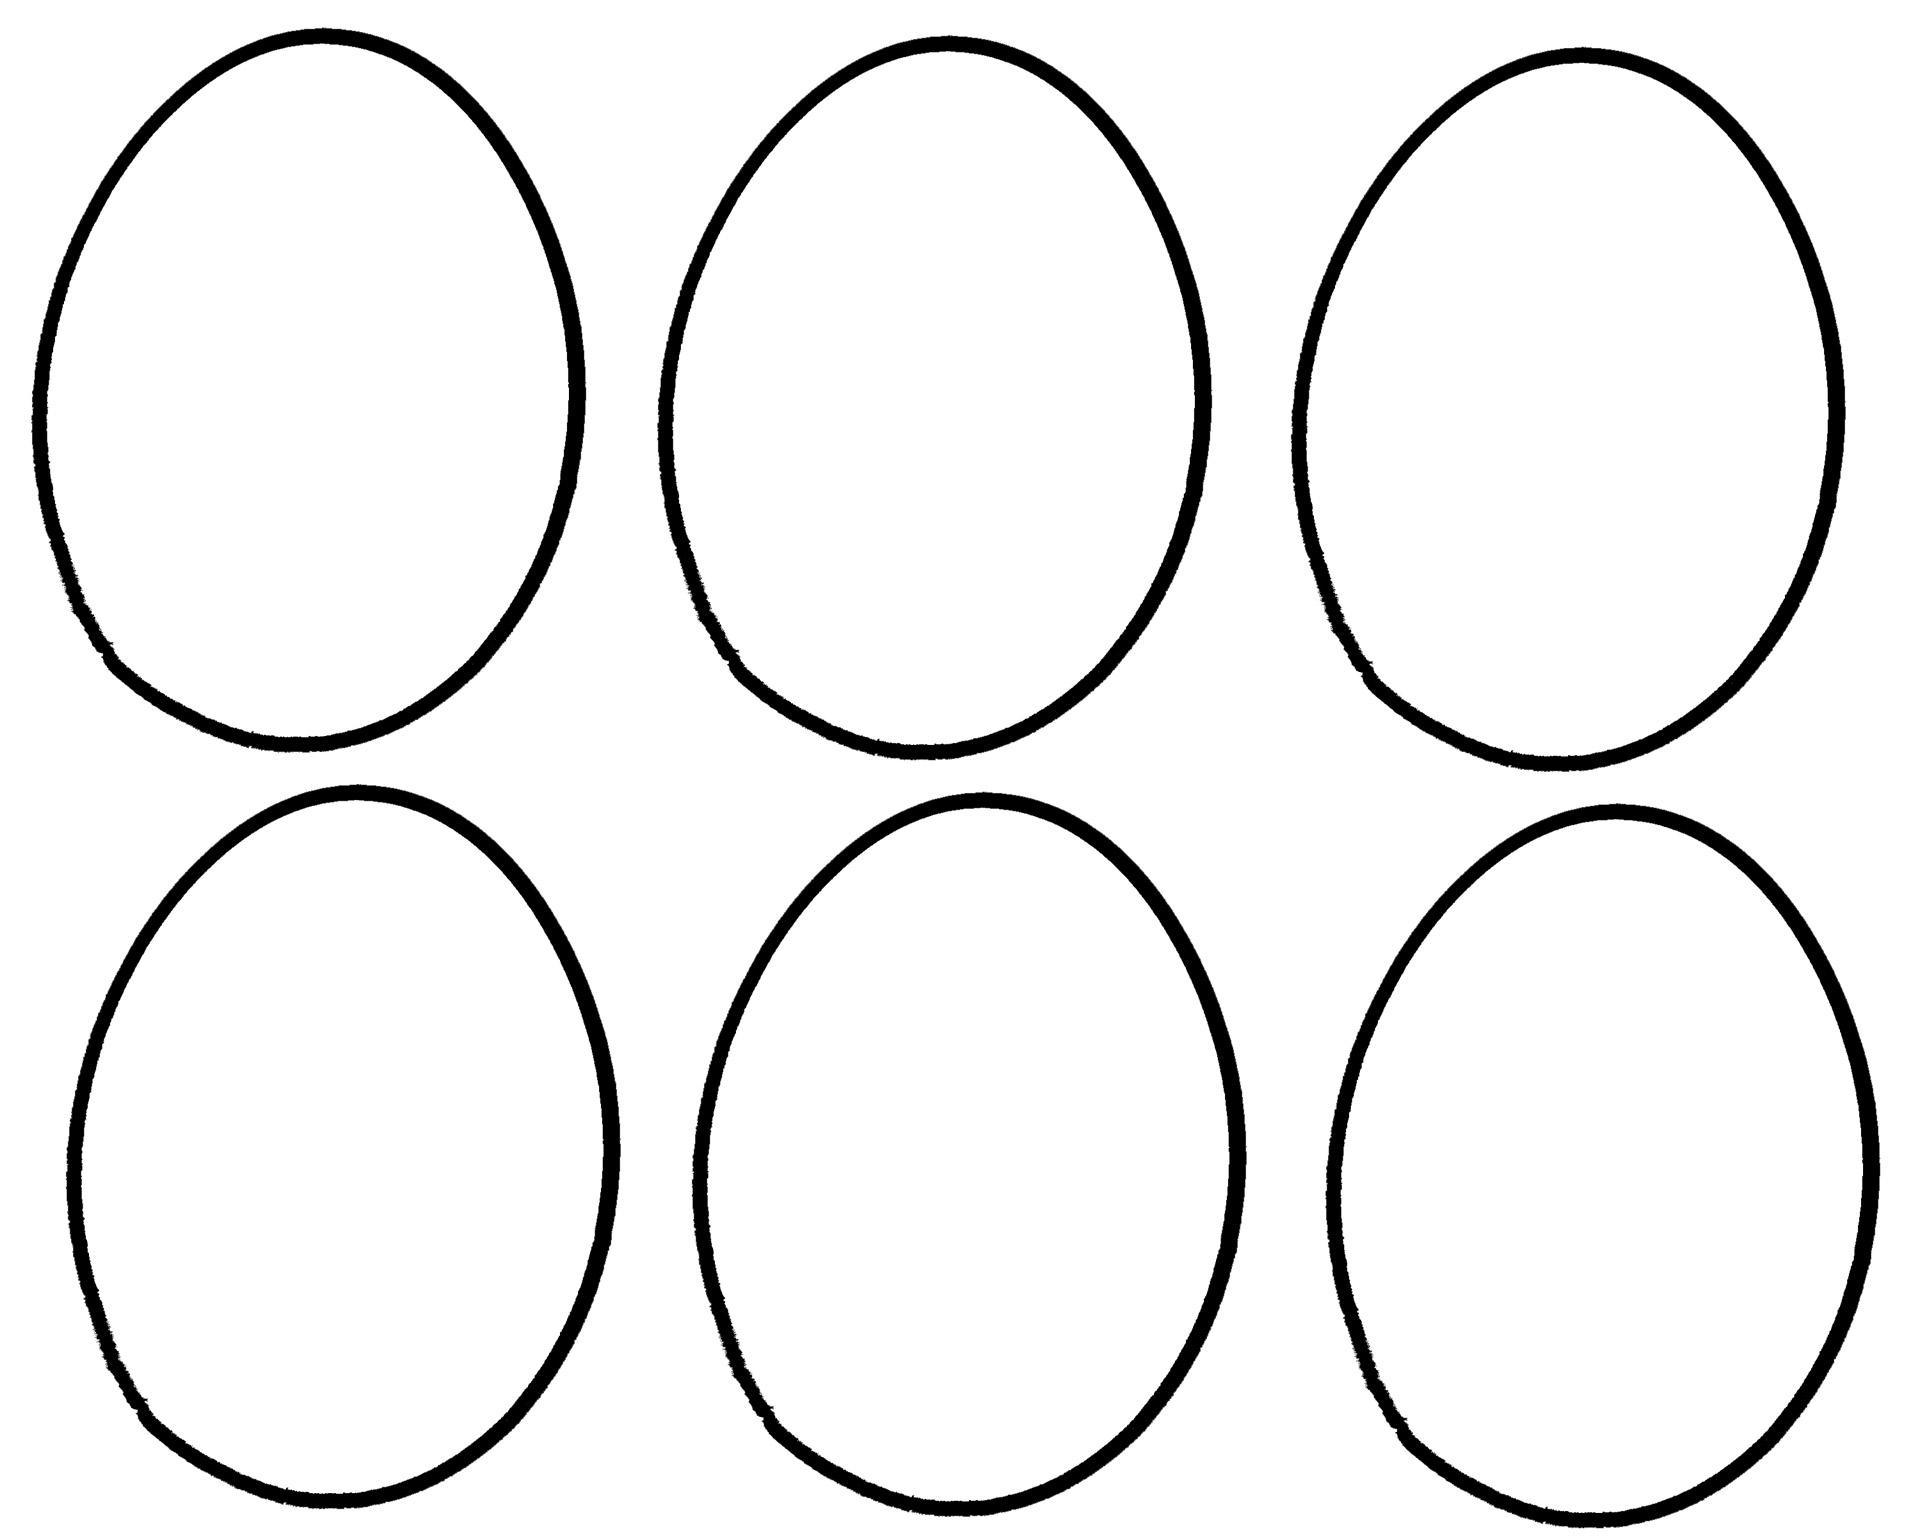 Egg Outlines